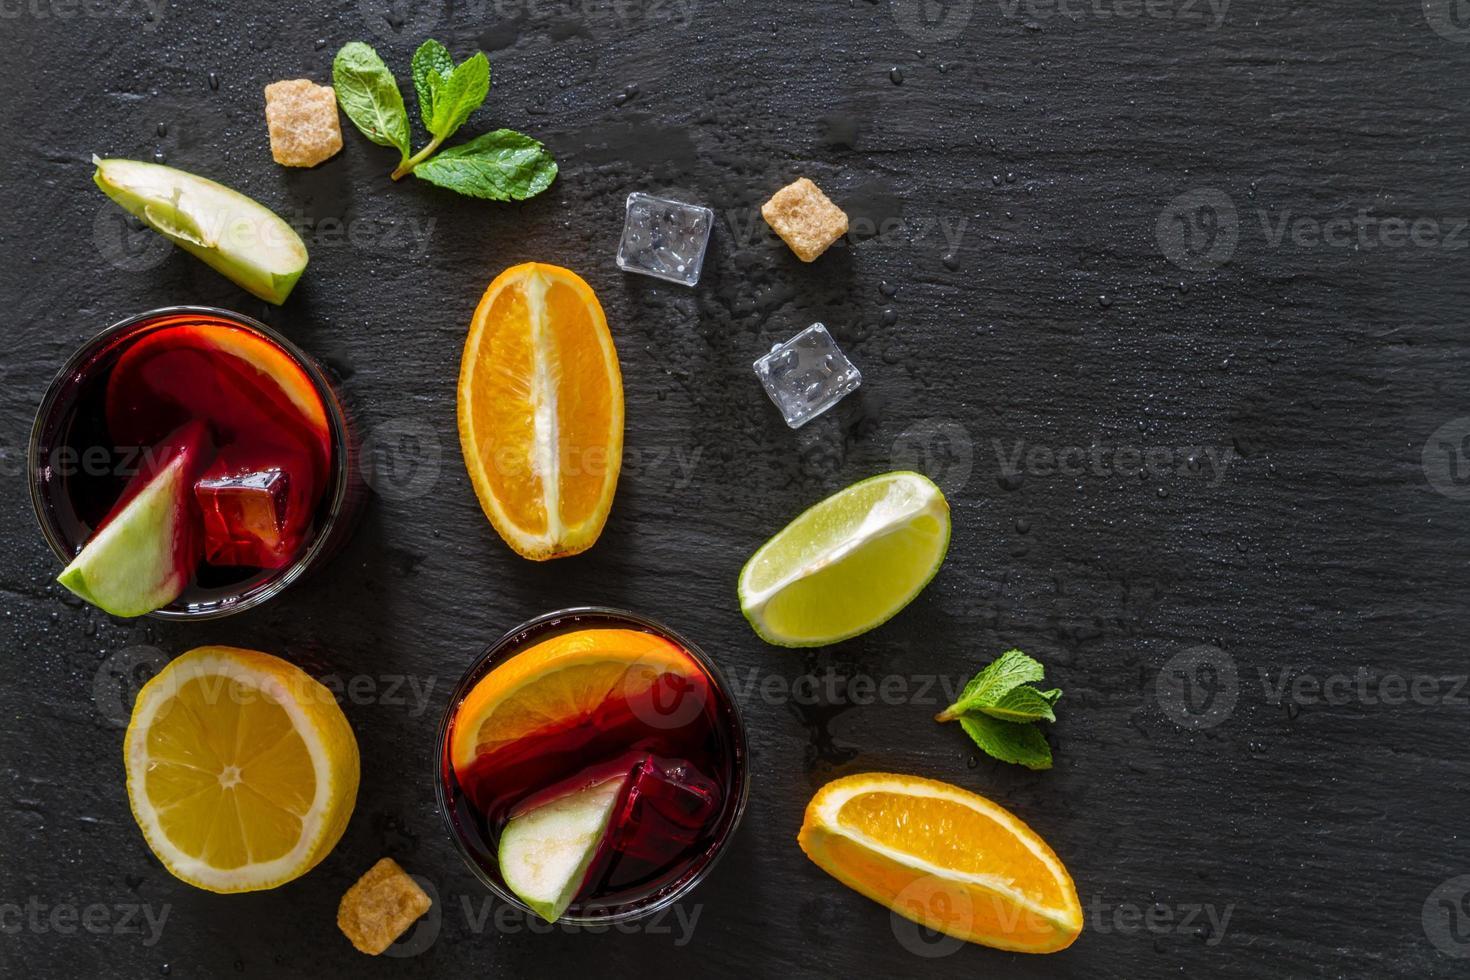 Sangria ingredients - orange, lemon and lime slices, wine photo